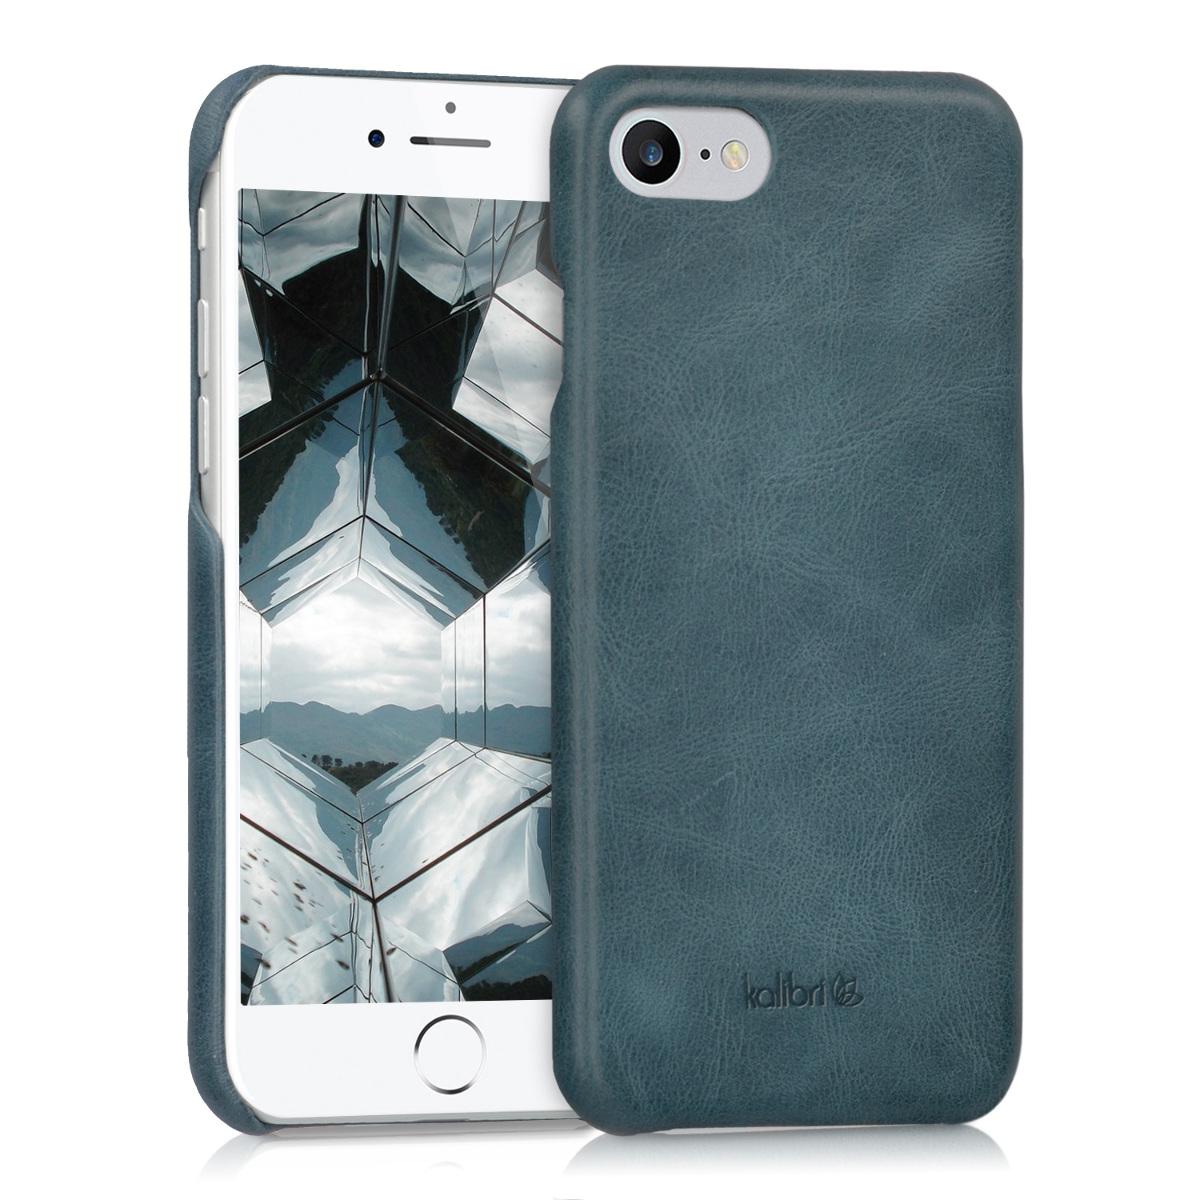 Kalibri Σκληρή Δερμάτινη Θήκη iPhone 8 / 7 - Dark Blue (39345.17)